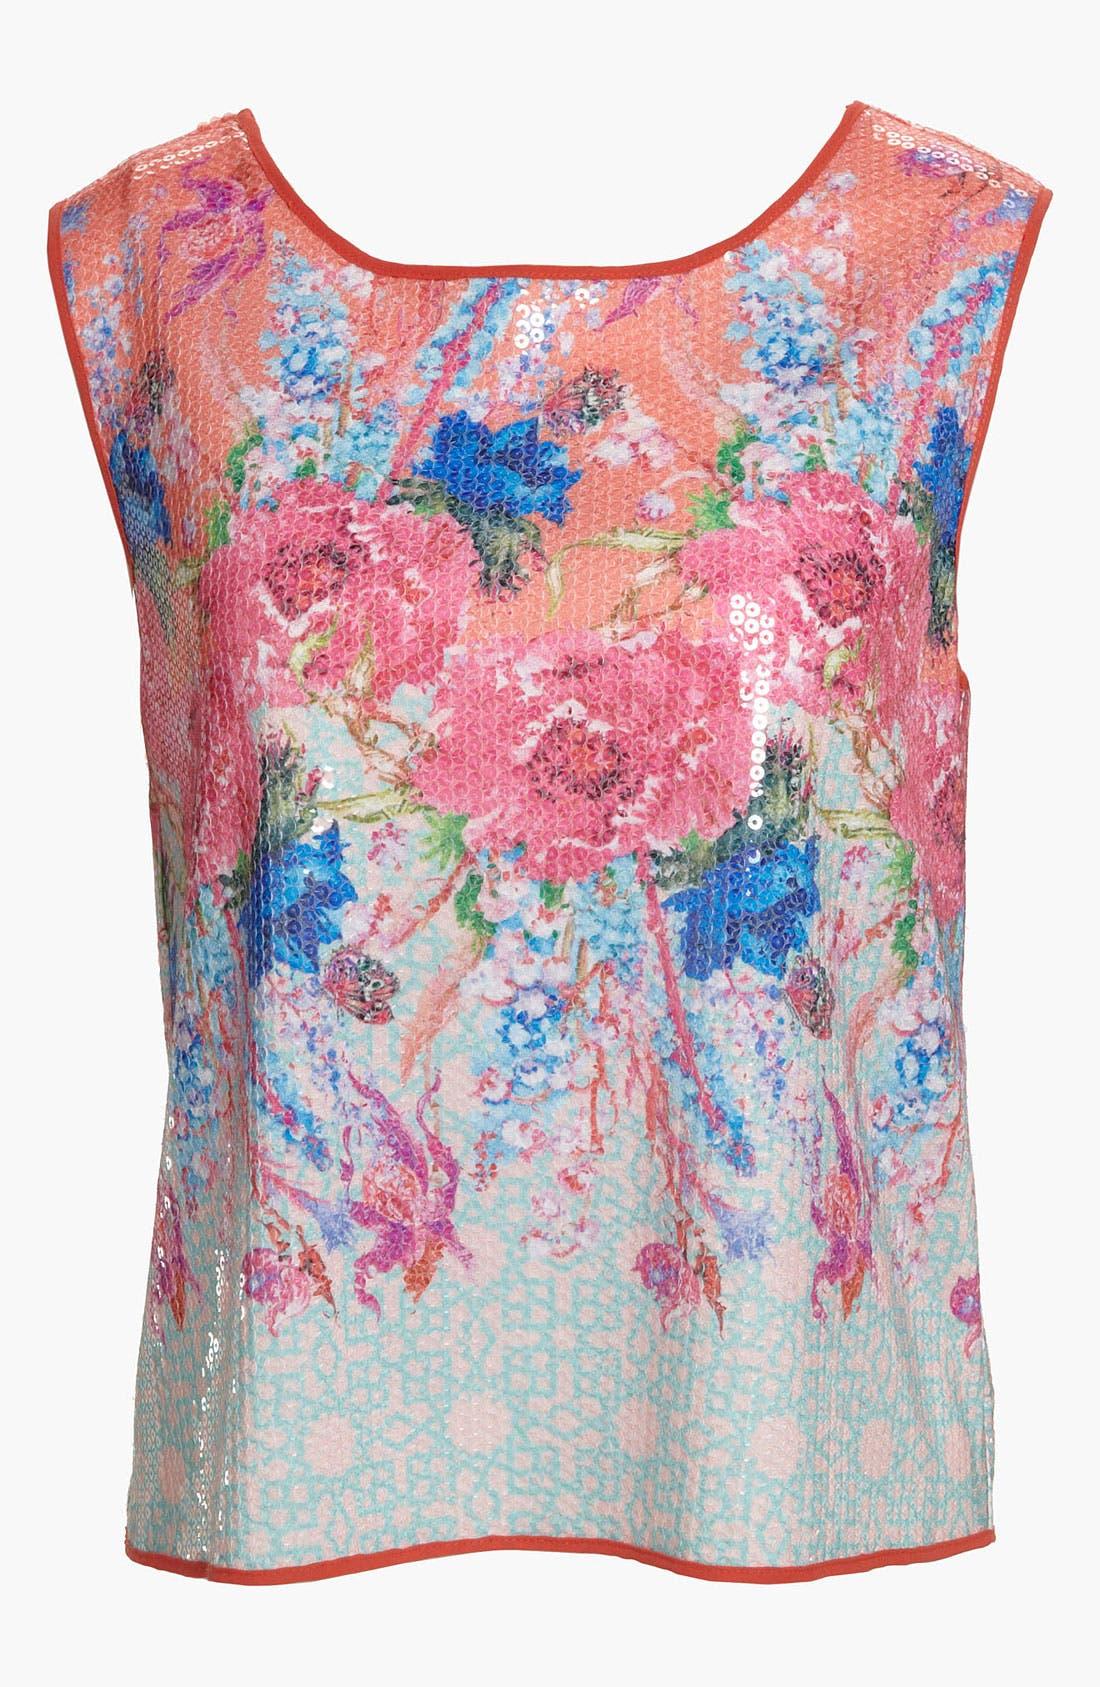 Main Image - Dream Daily 'Vermilion Flowers' Sequin Crop Top